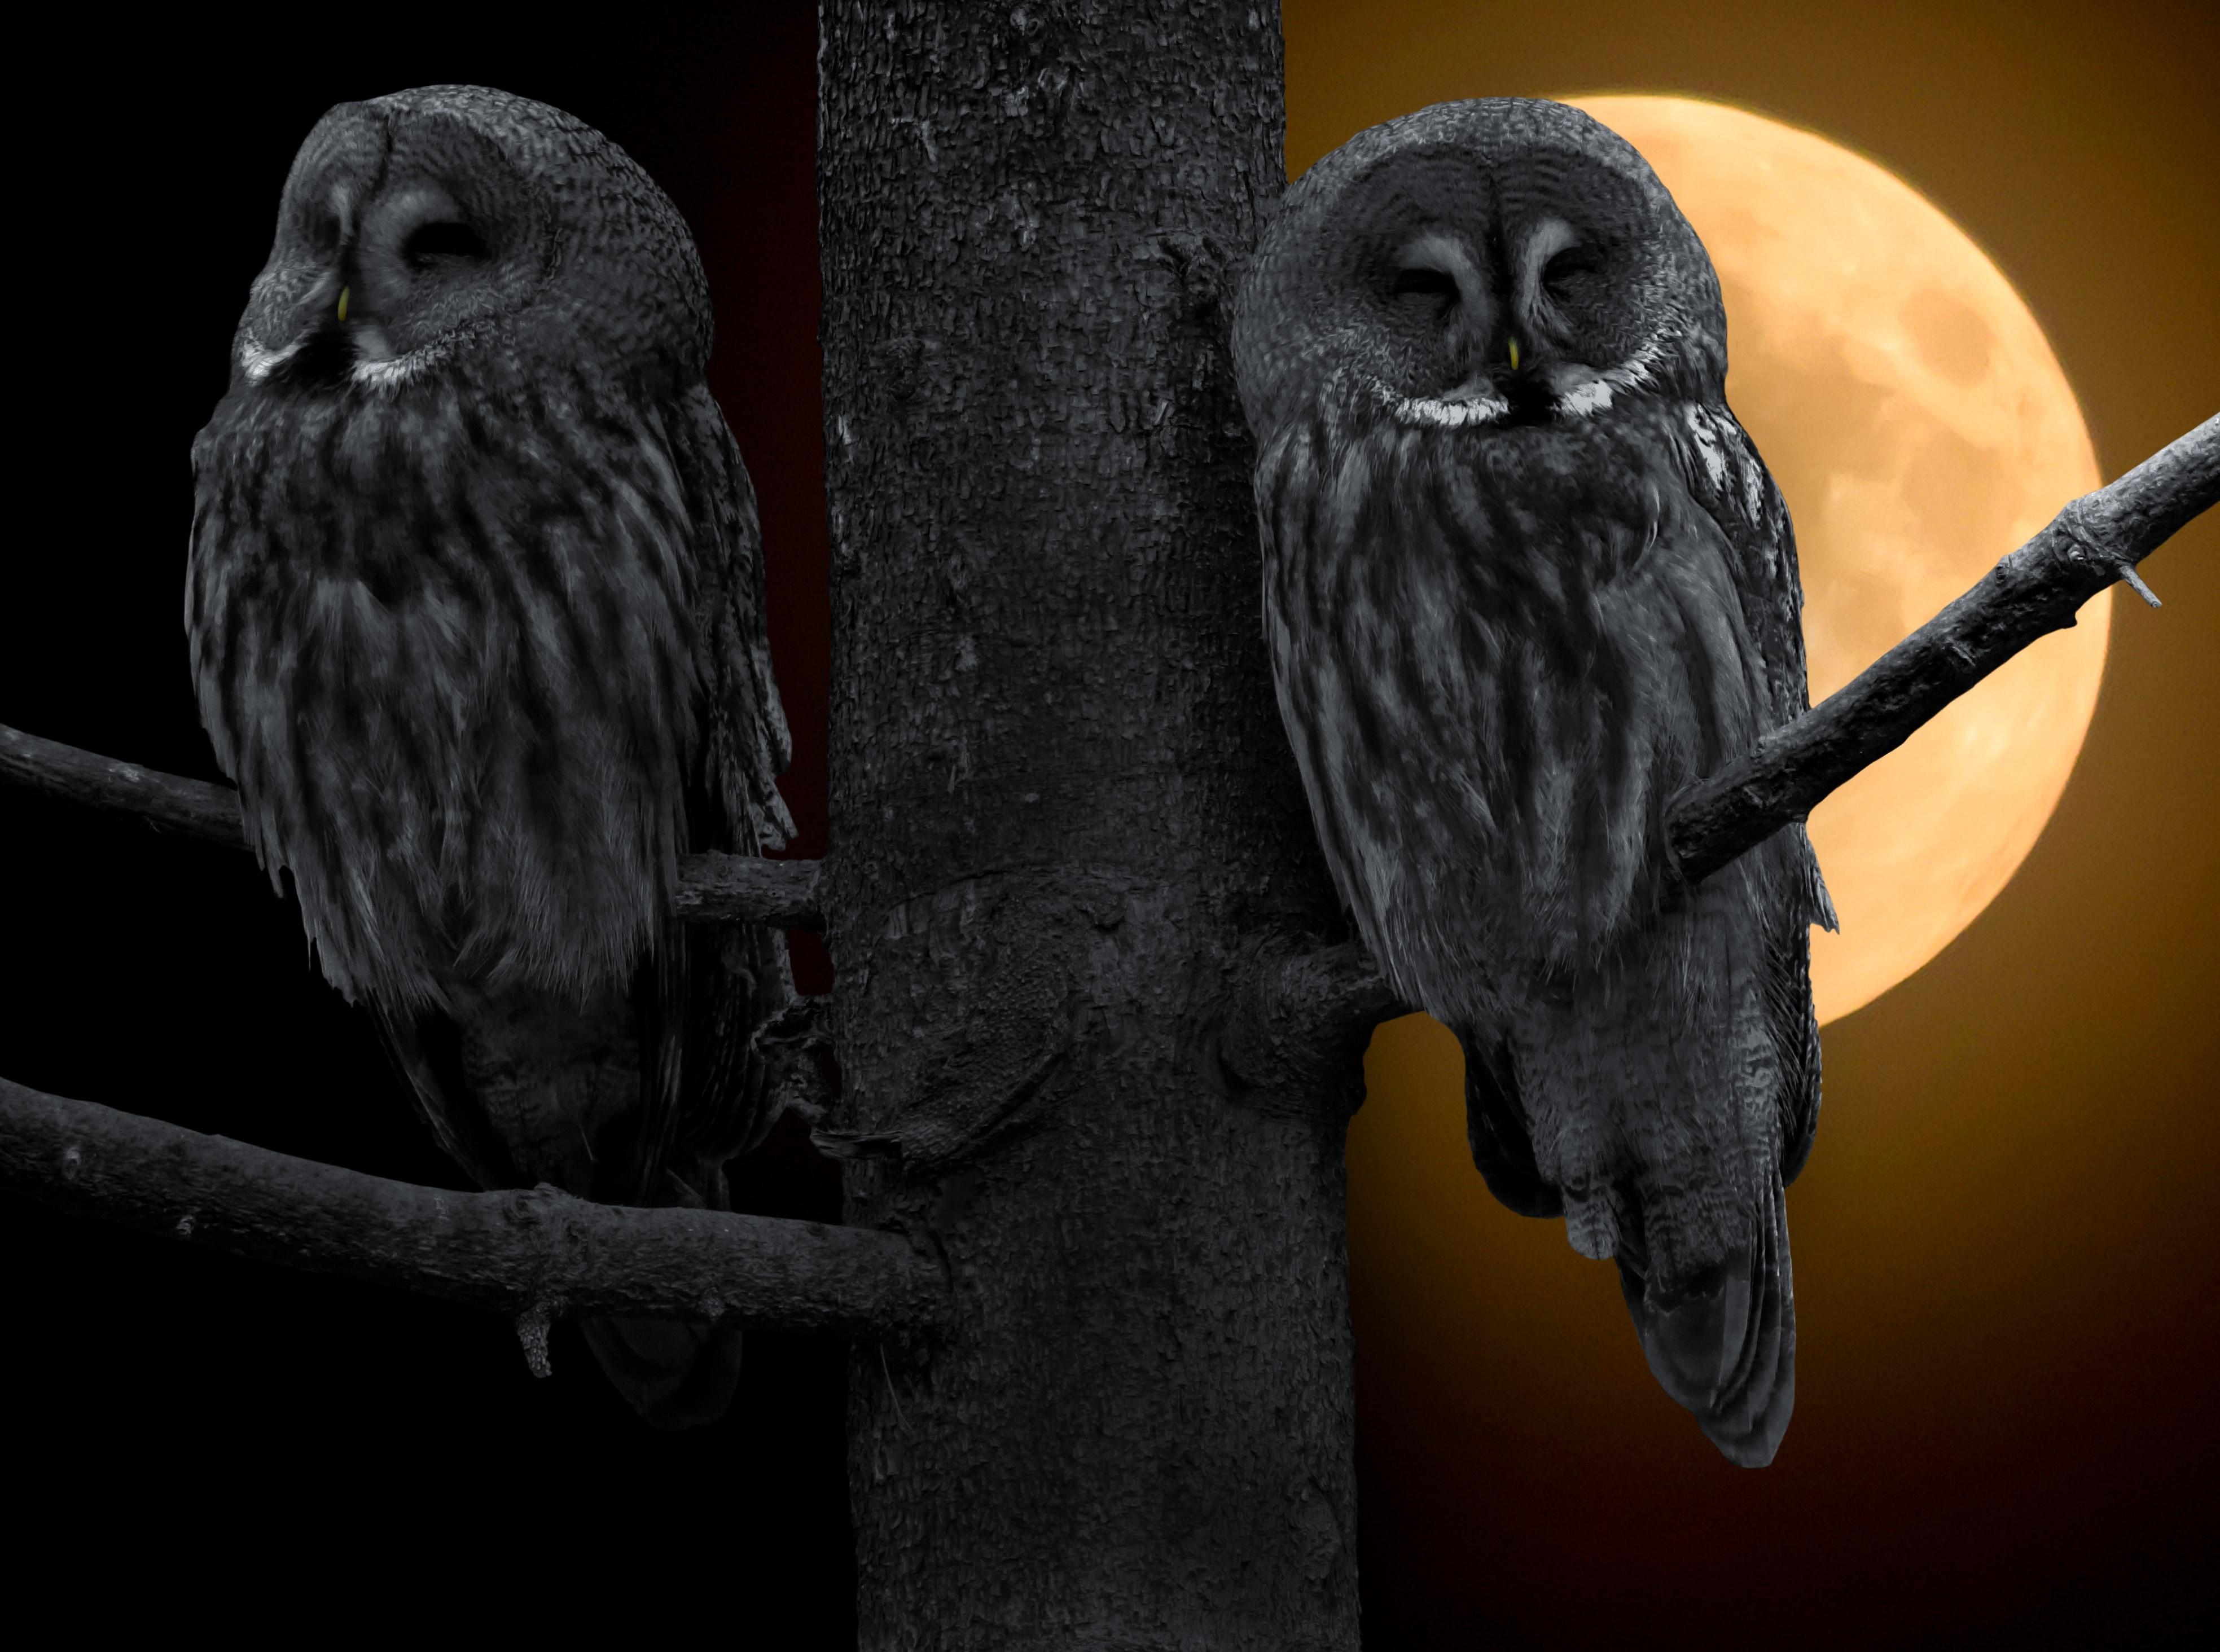 Free Animal Wallpaper Backgrounds Dark Owl Wallpapers Pixelstalk Net